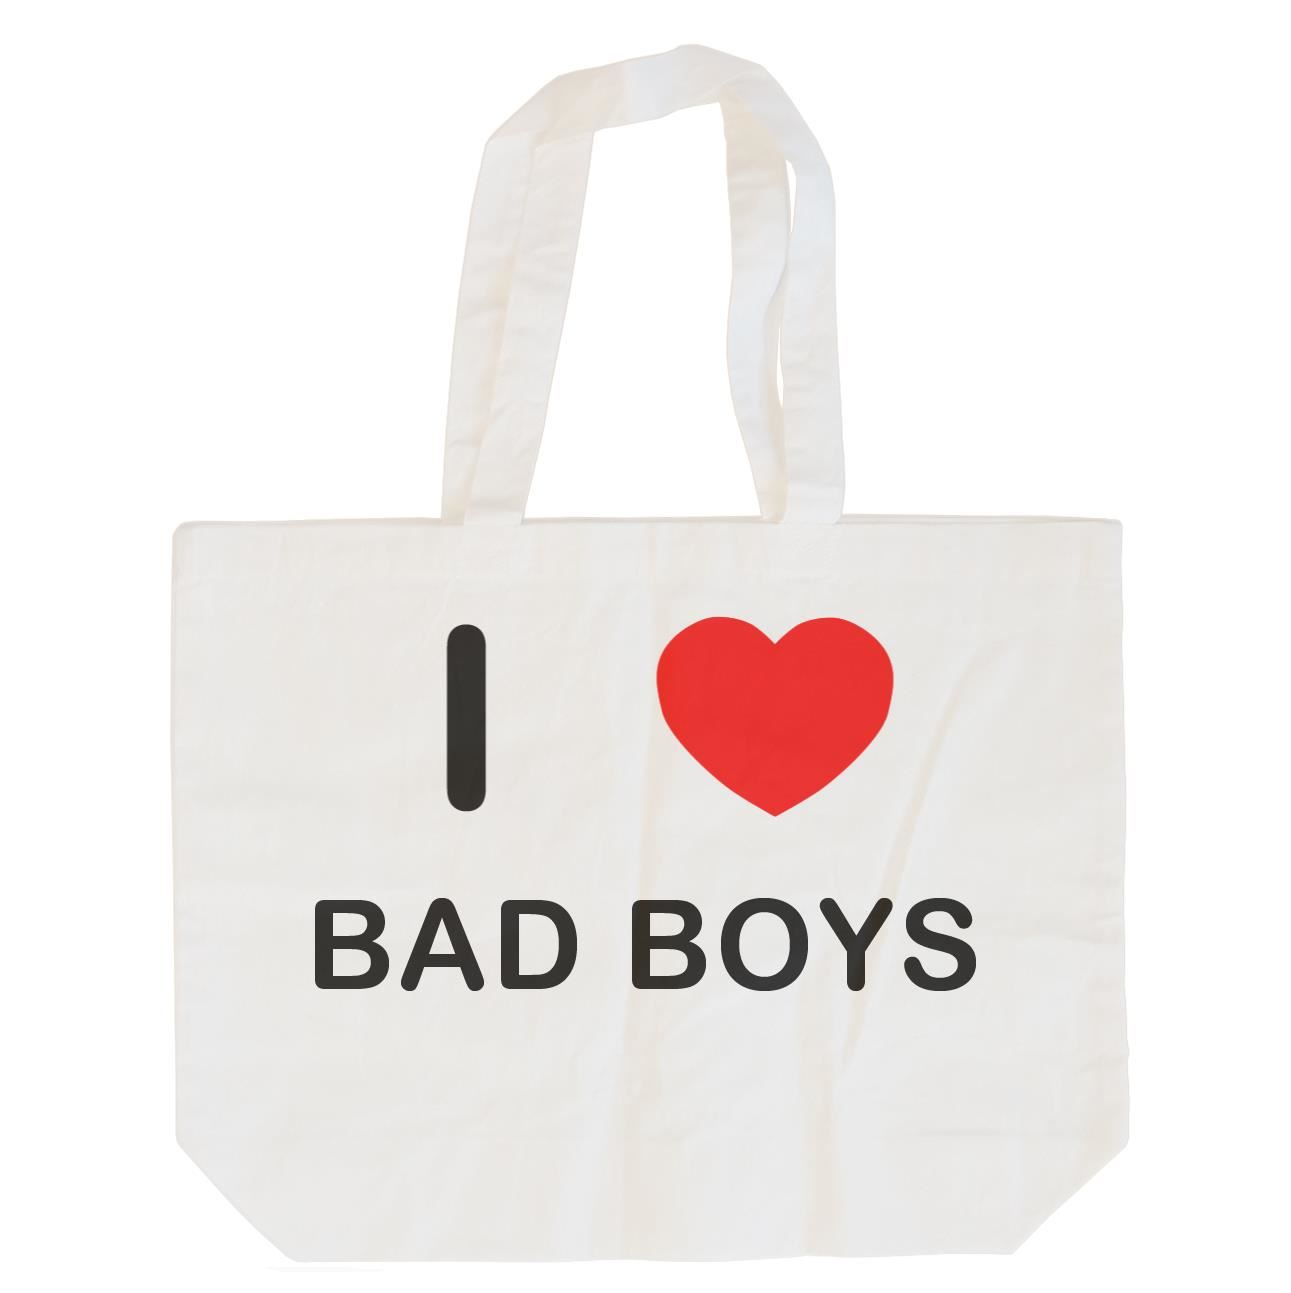 I Love Bad Boys - Cotton Bag | Size choice Tote, Shopper or Sling